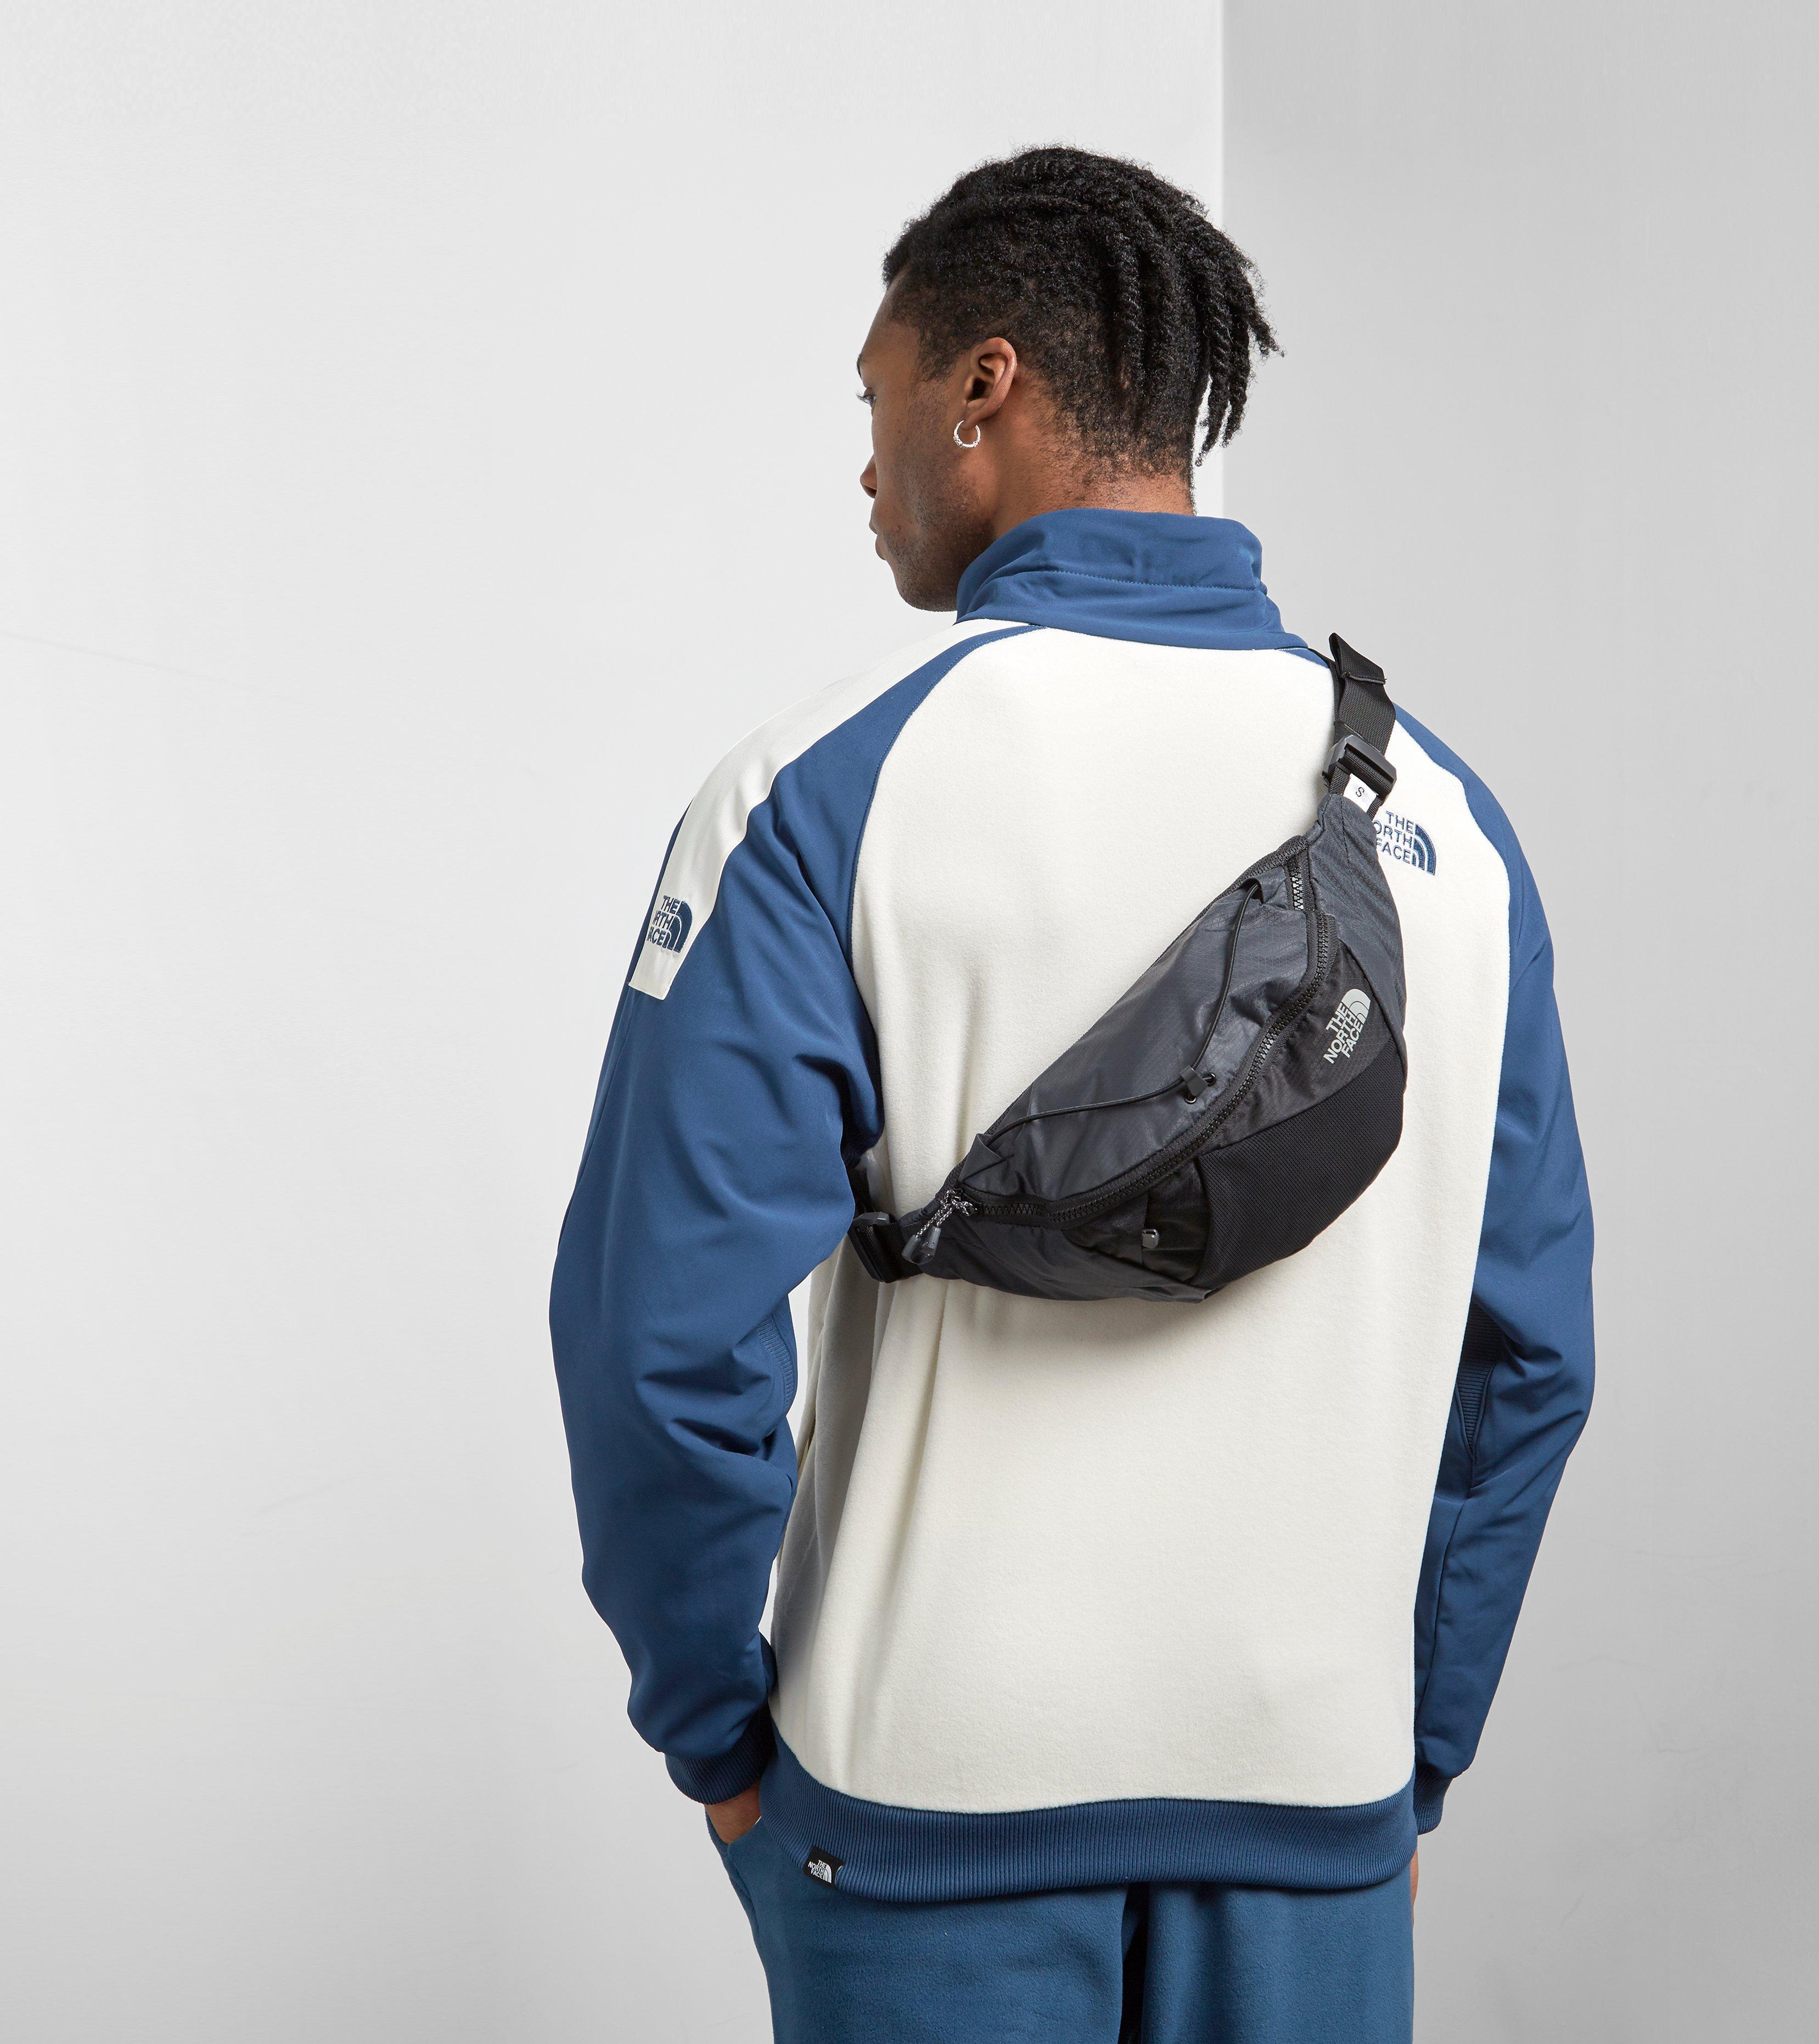 Air Bag Jack >> Lyst - The North Face Lumbnical Lumbar Waist Bag in Black for Men